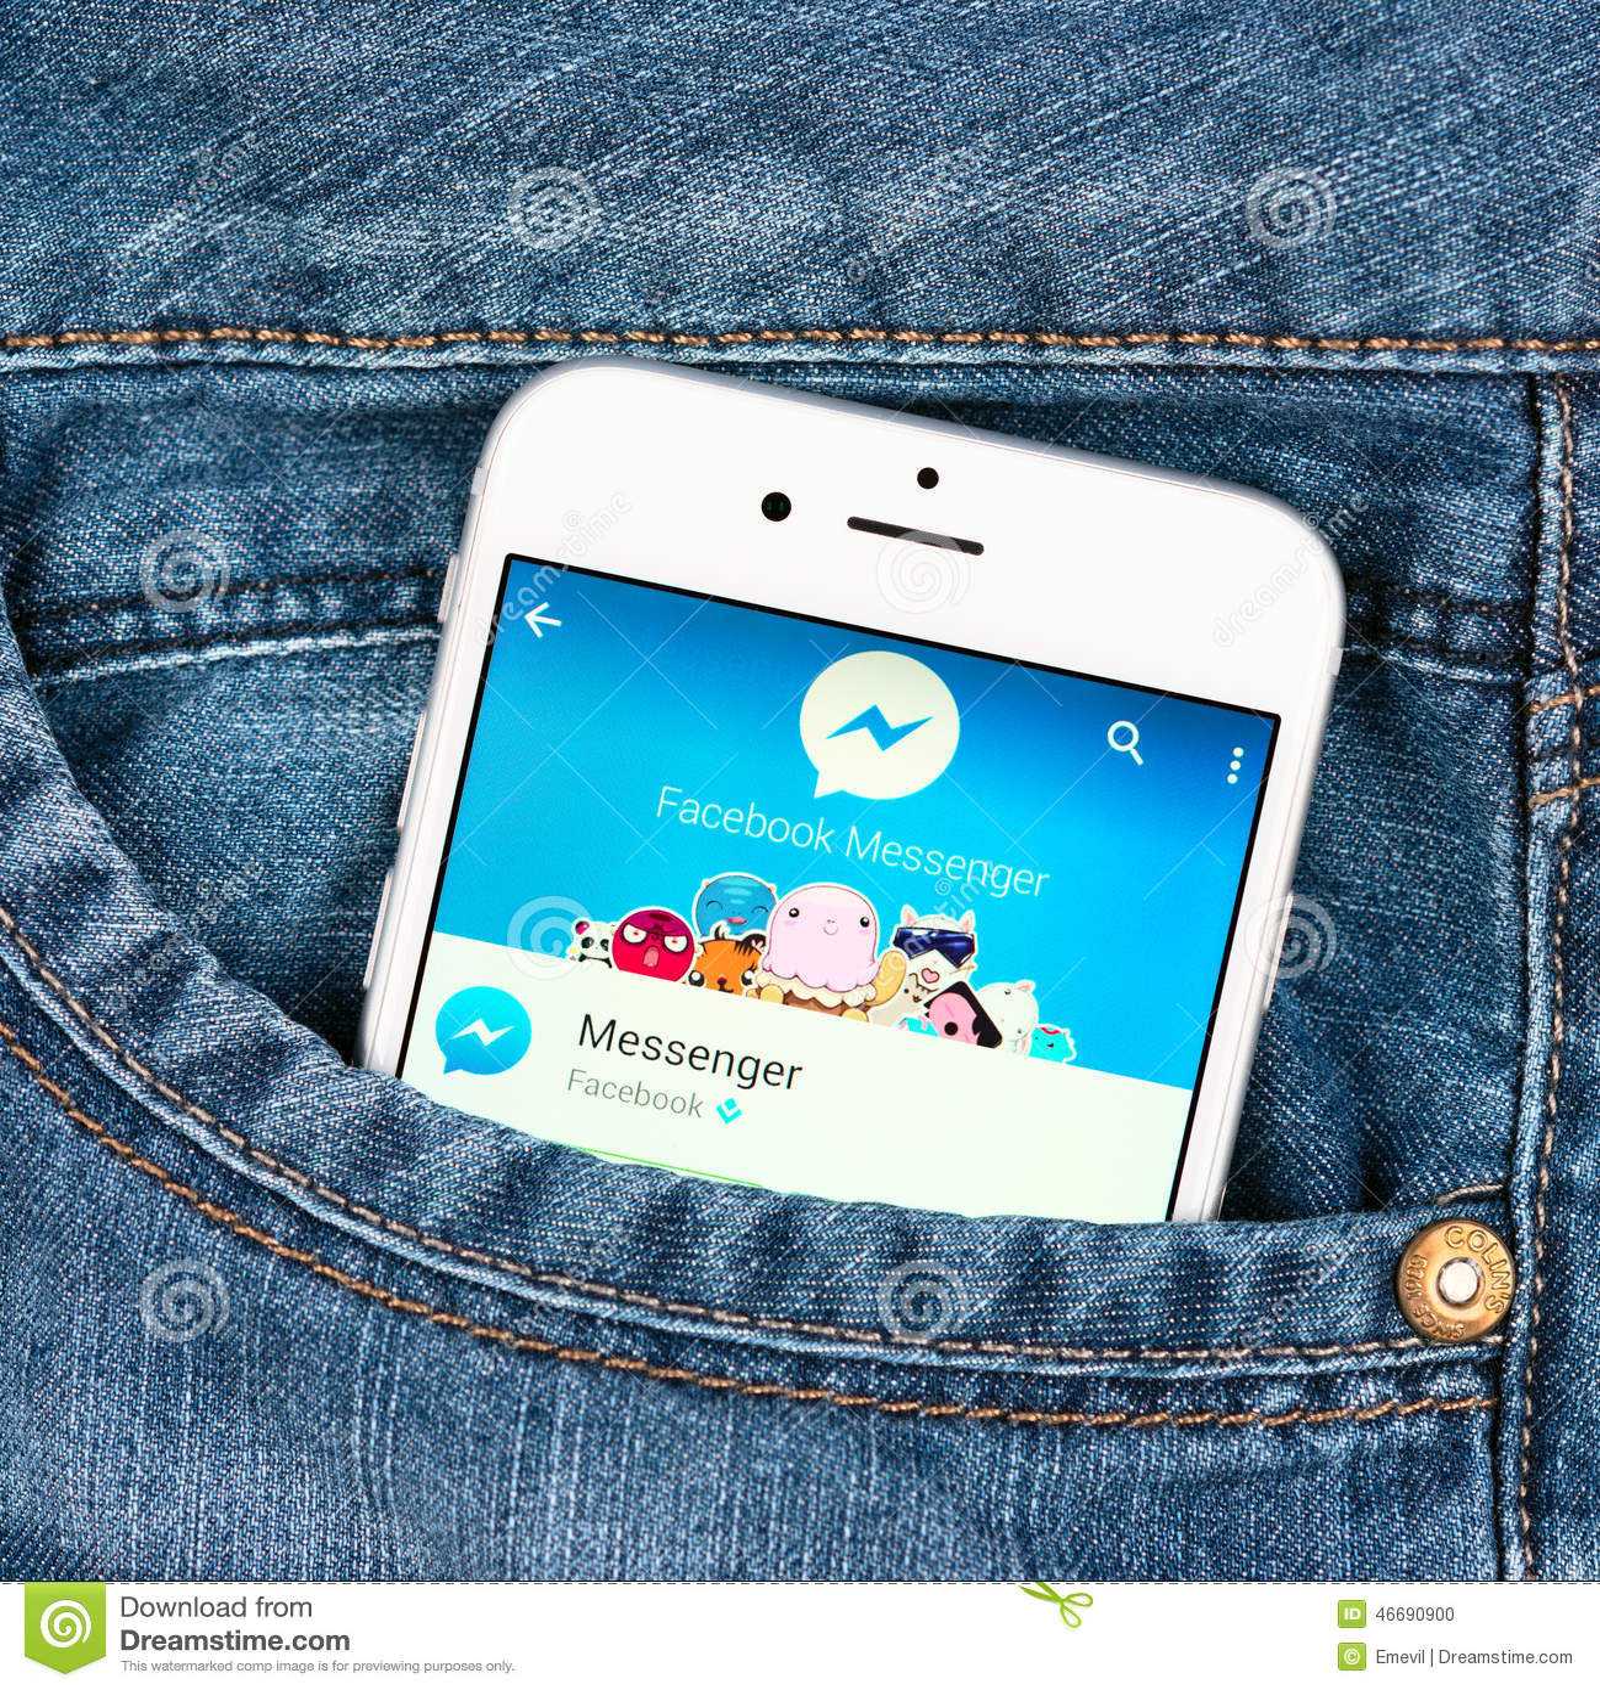 Silver Apple Iphone 6 Displaying Facebook Messenger